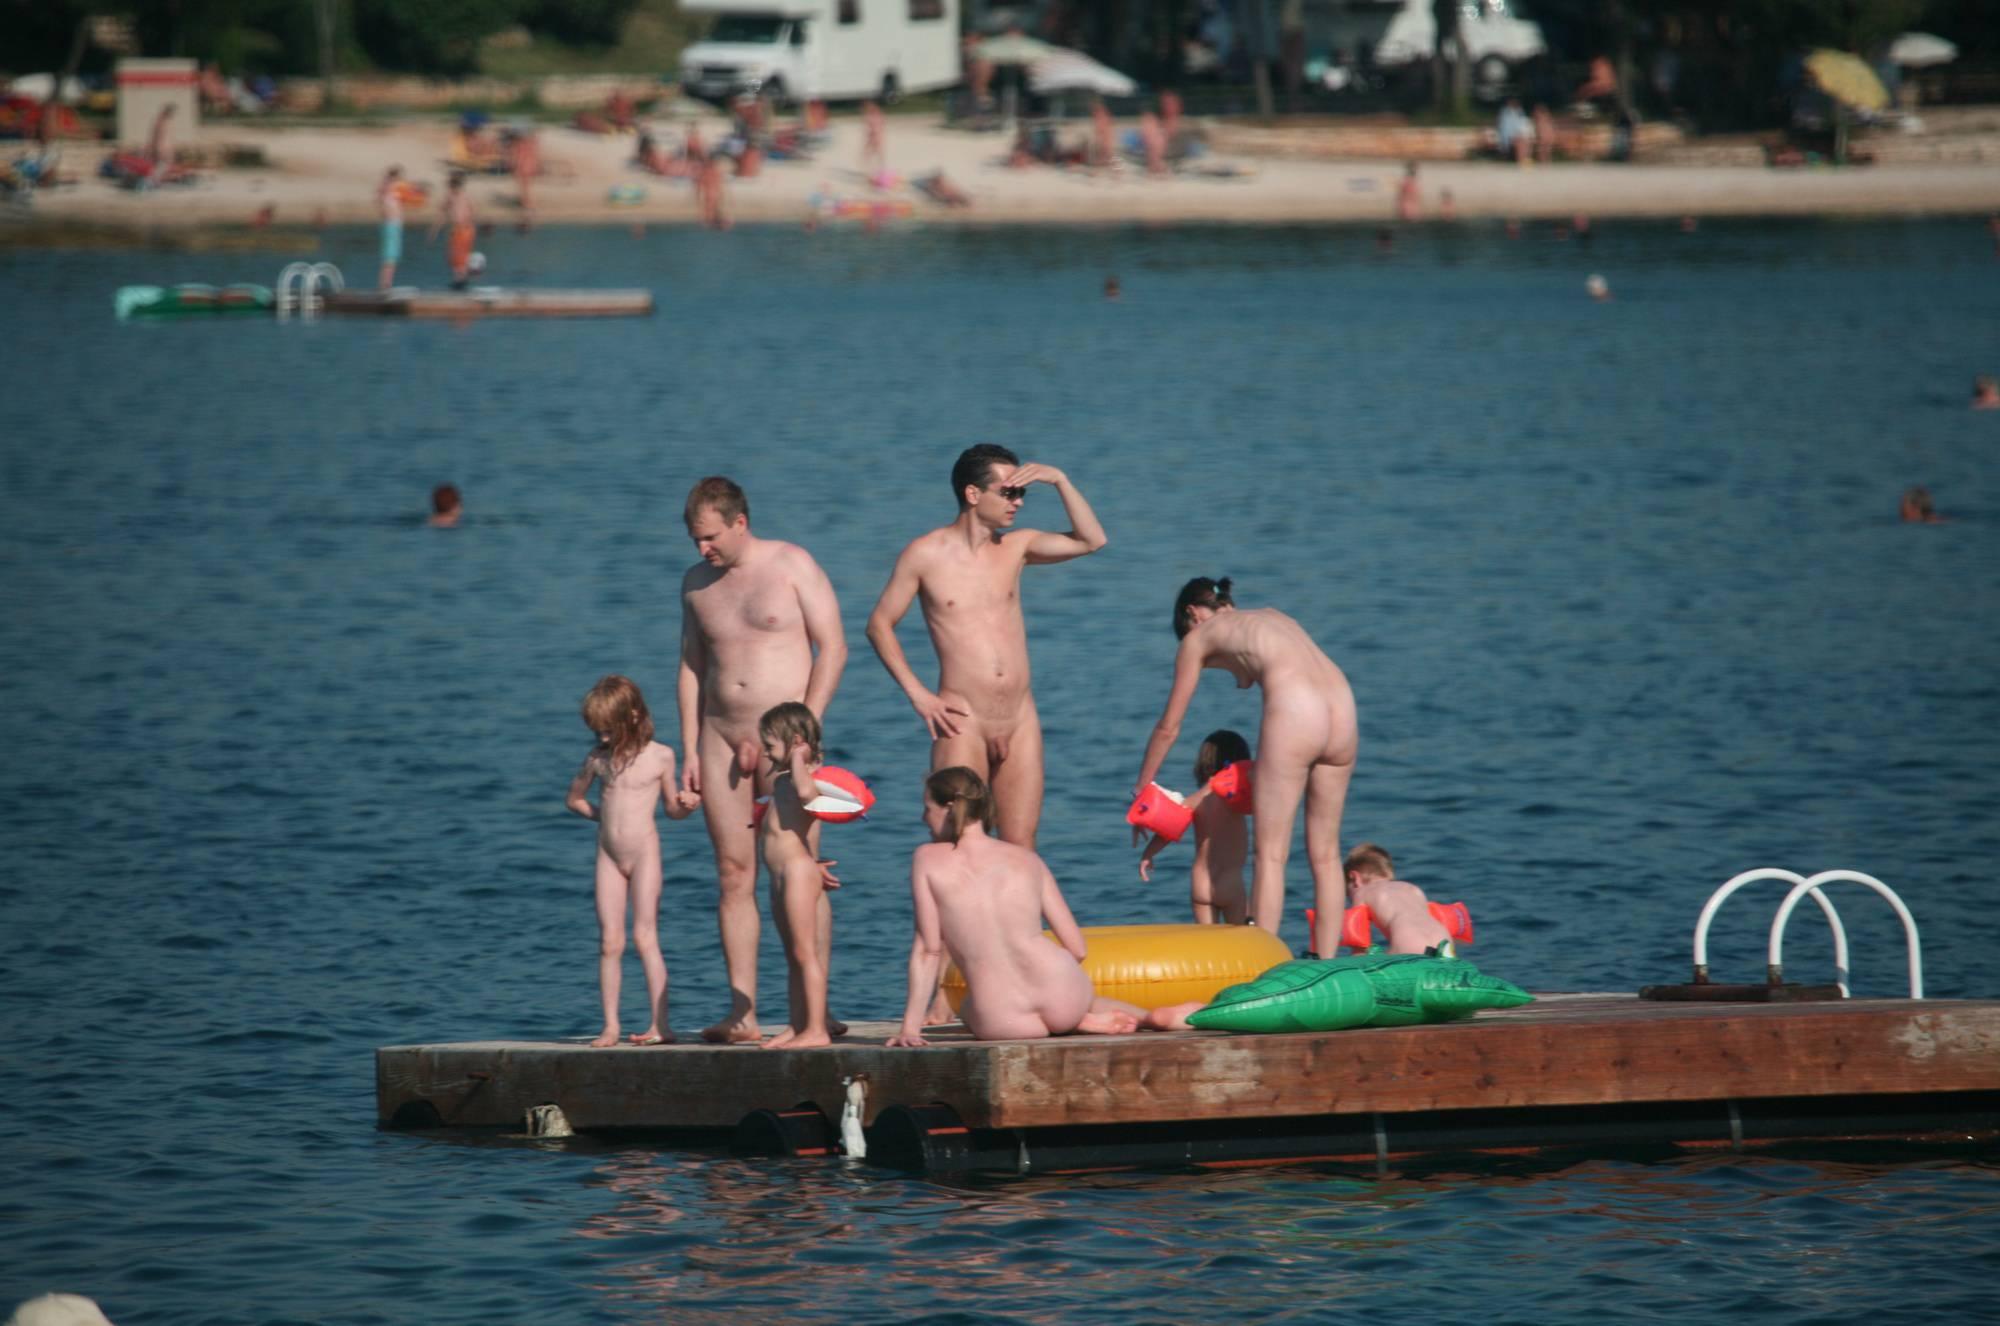 Purenudism Pics Naturist Family Water Slab - 2